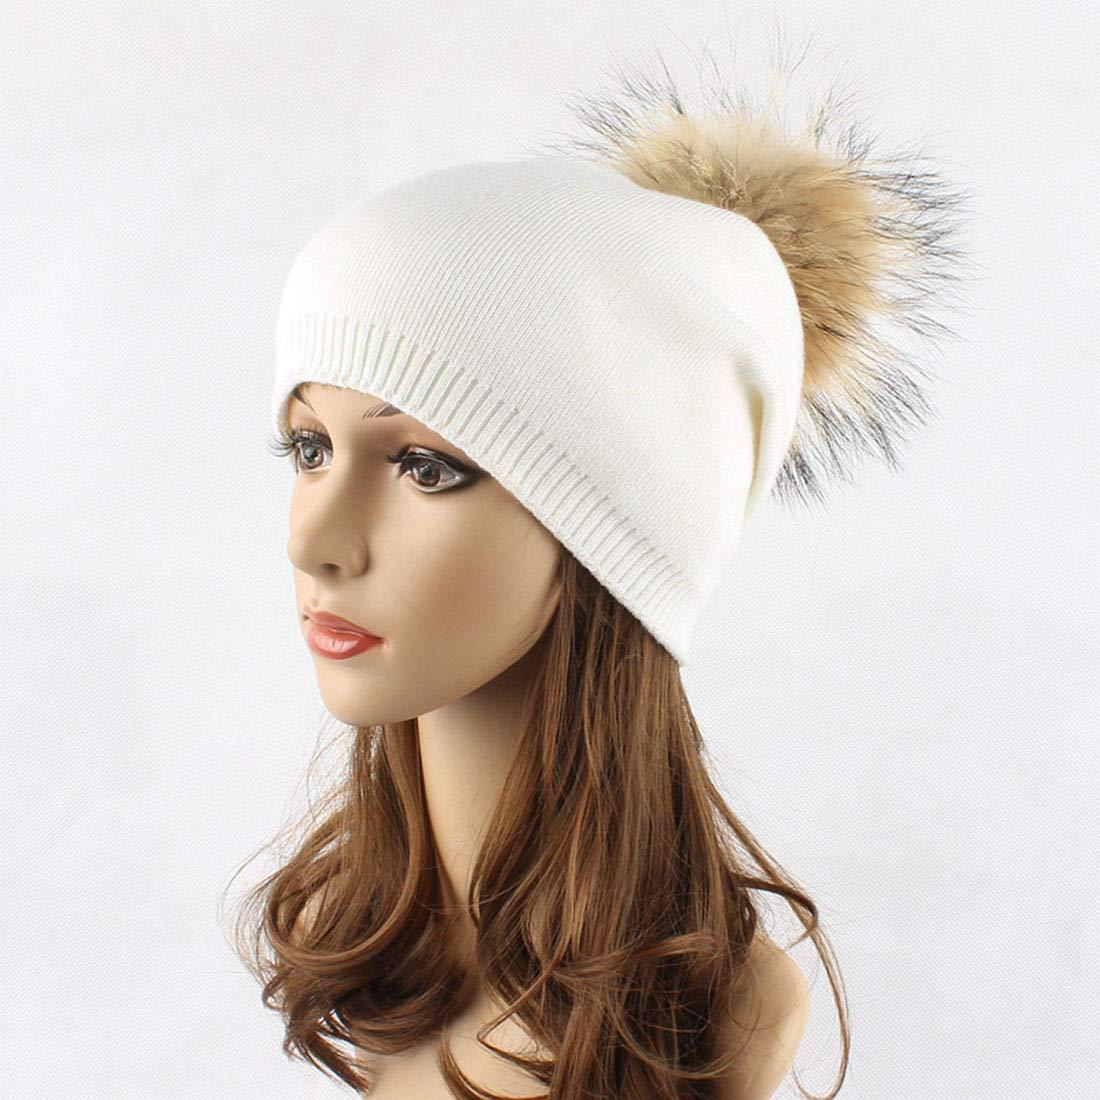 Women Wool Hats Soft Classic Fashion Girls Stretchable Artist Hat